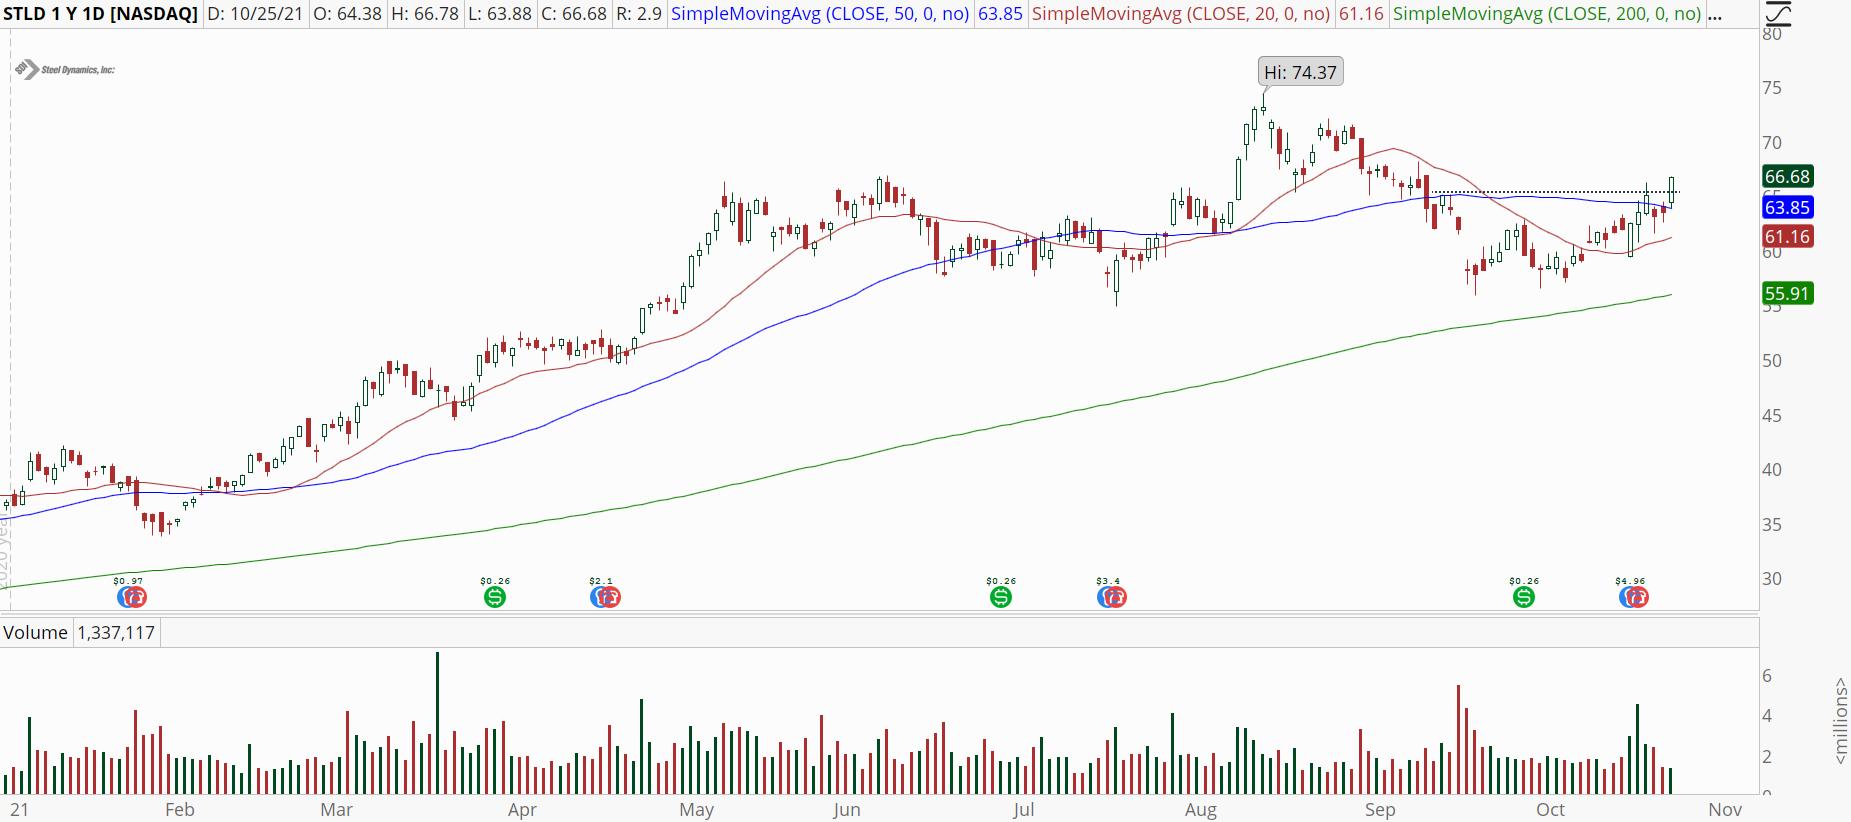 Steel Dynamics (STLD) stock chart with bullish breakout